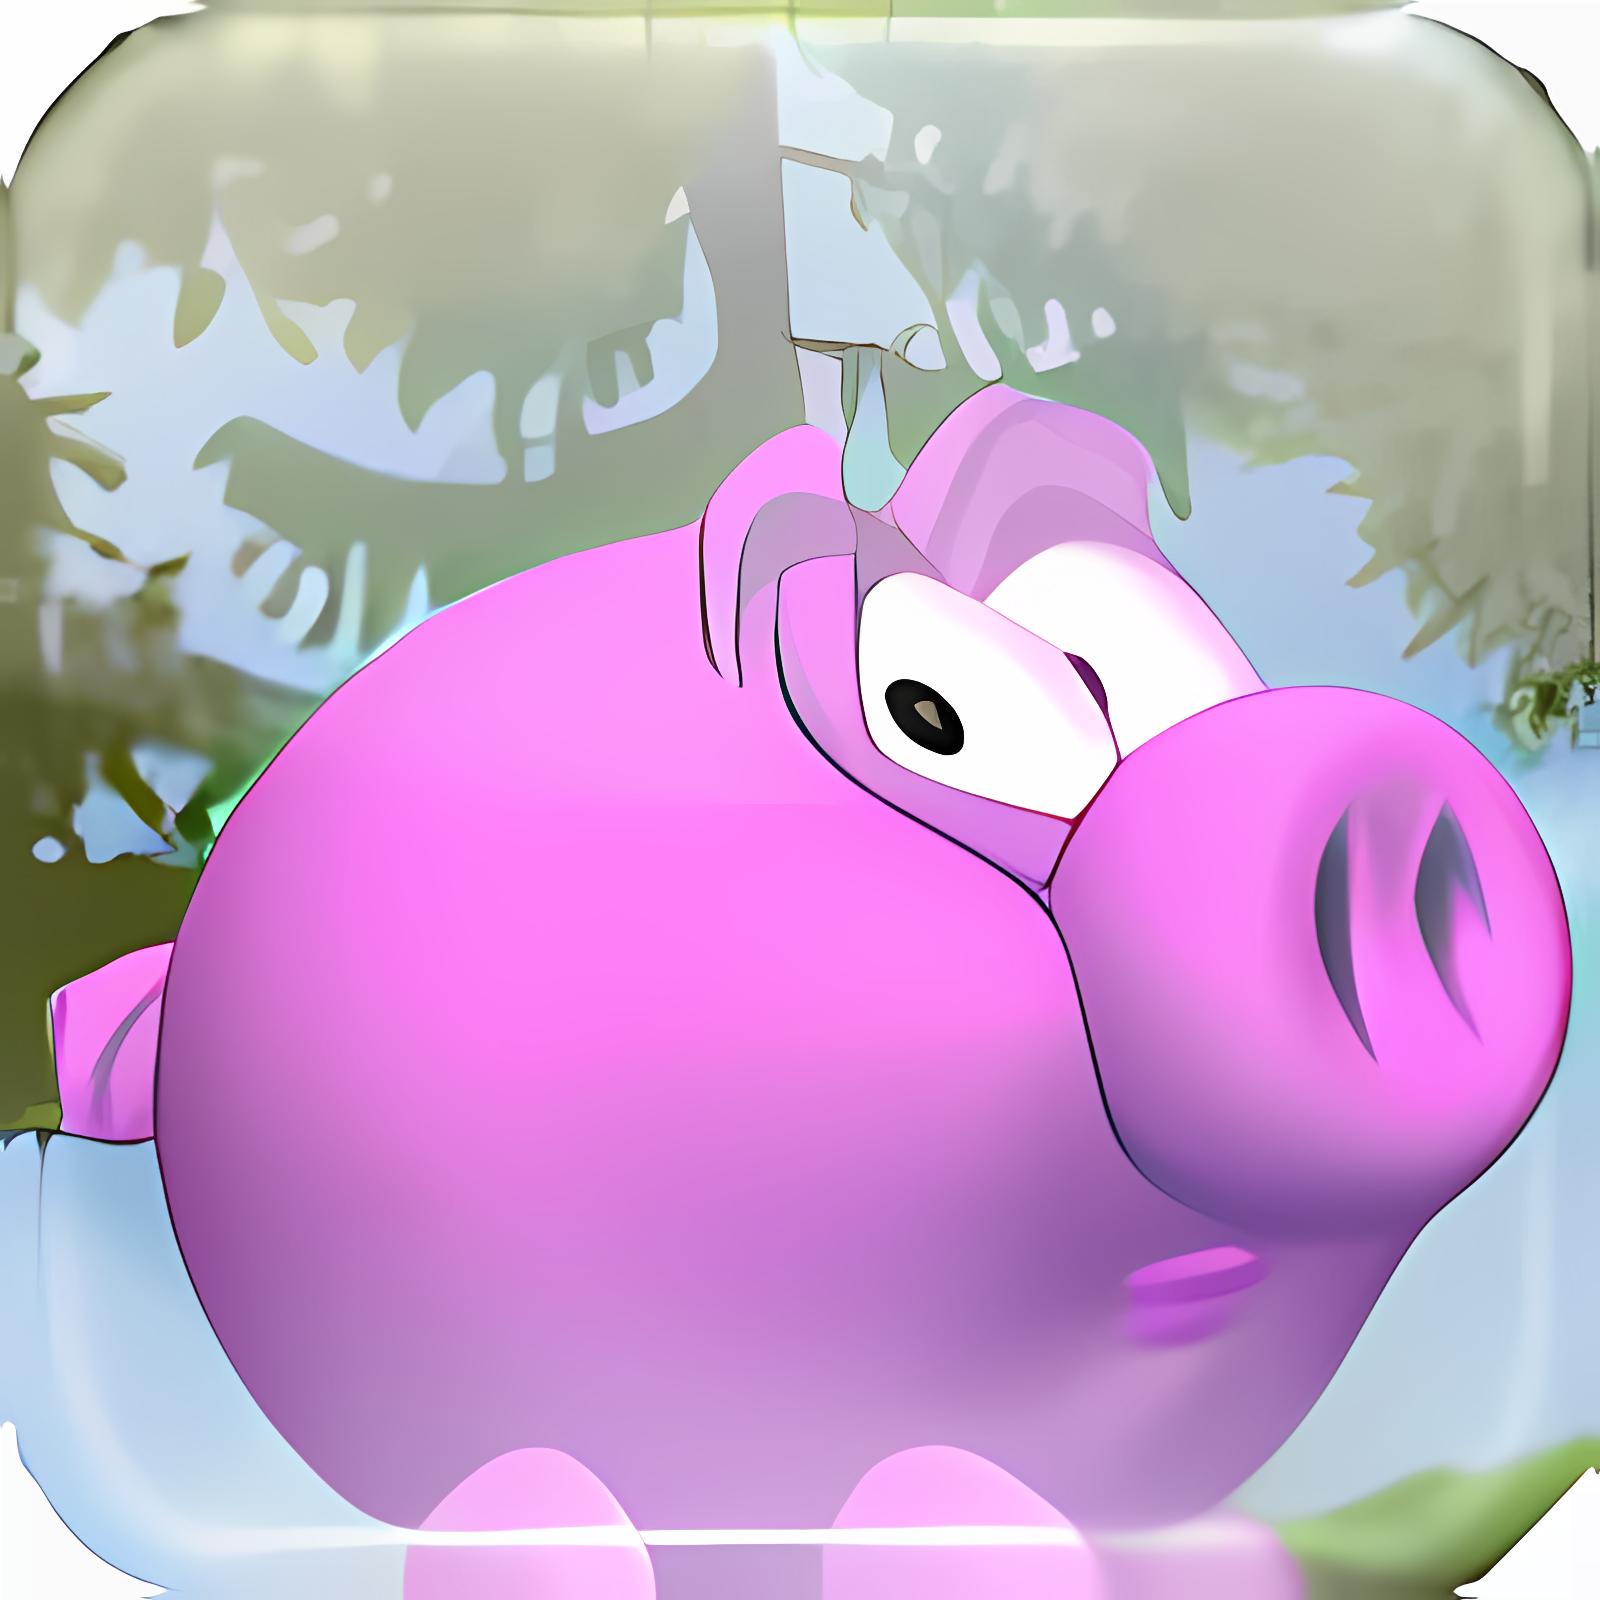 Piggly